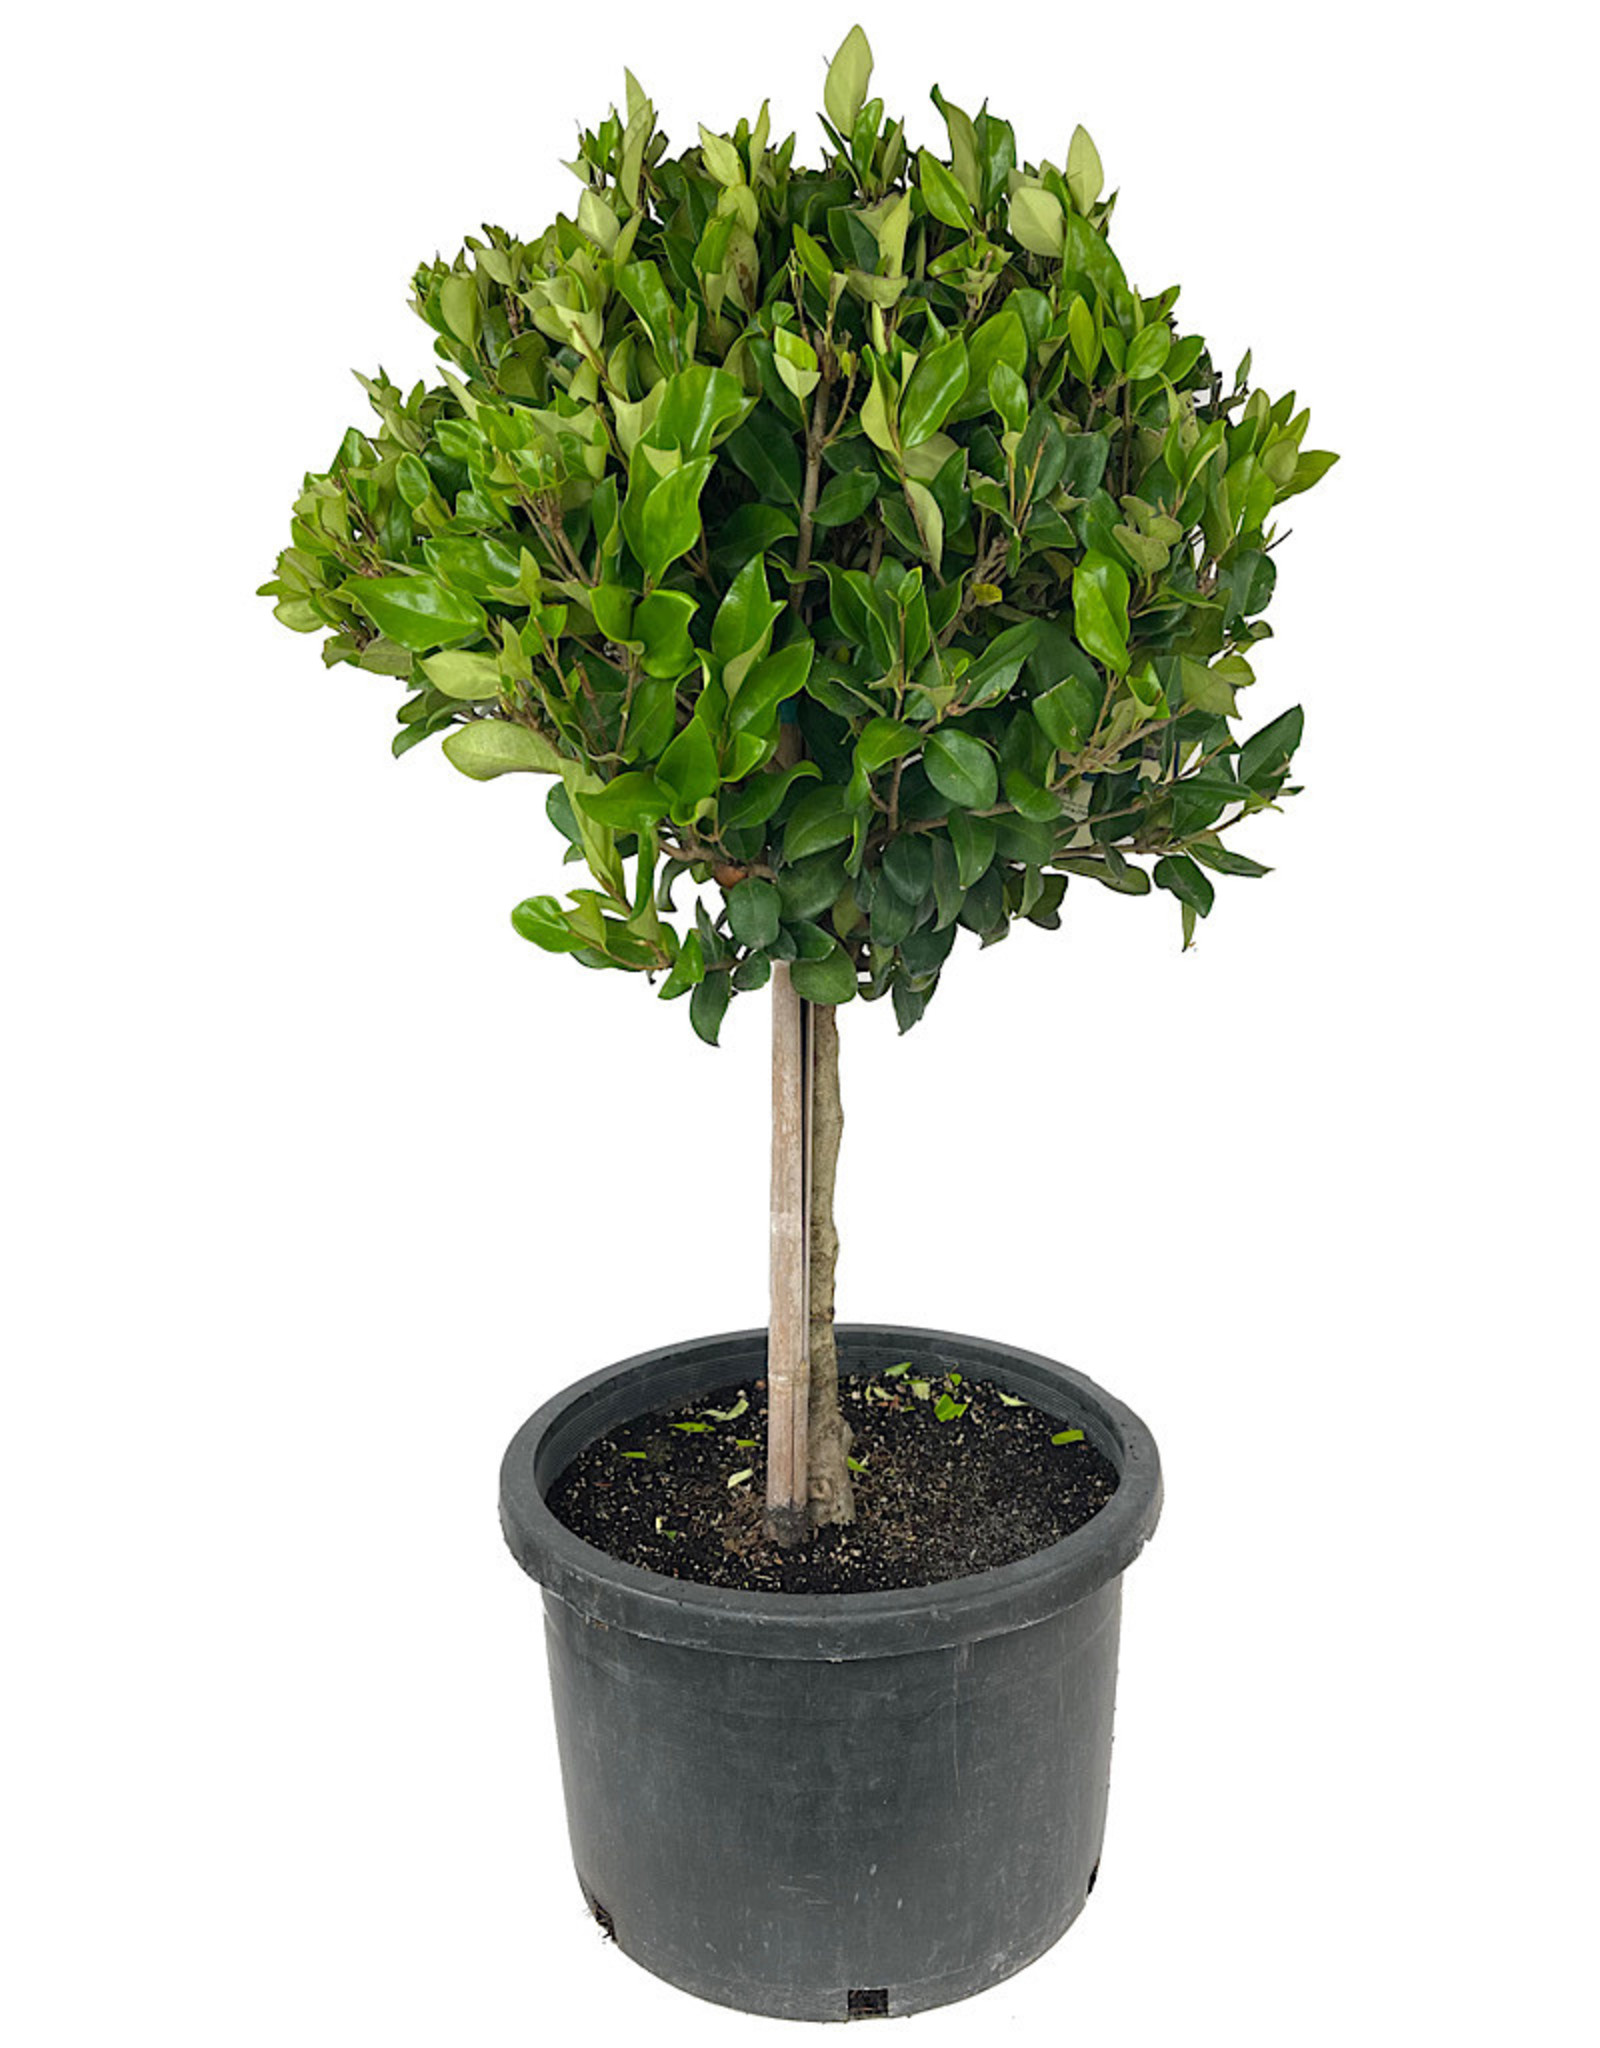 Ligustrum japonicum 'Texanum' 10 Gallon Short Patio Tree